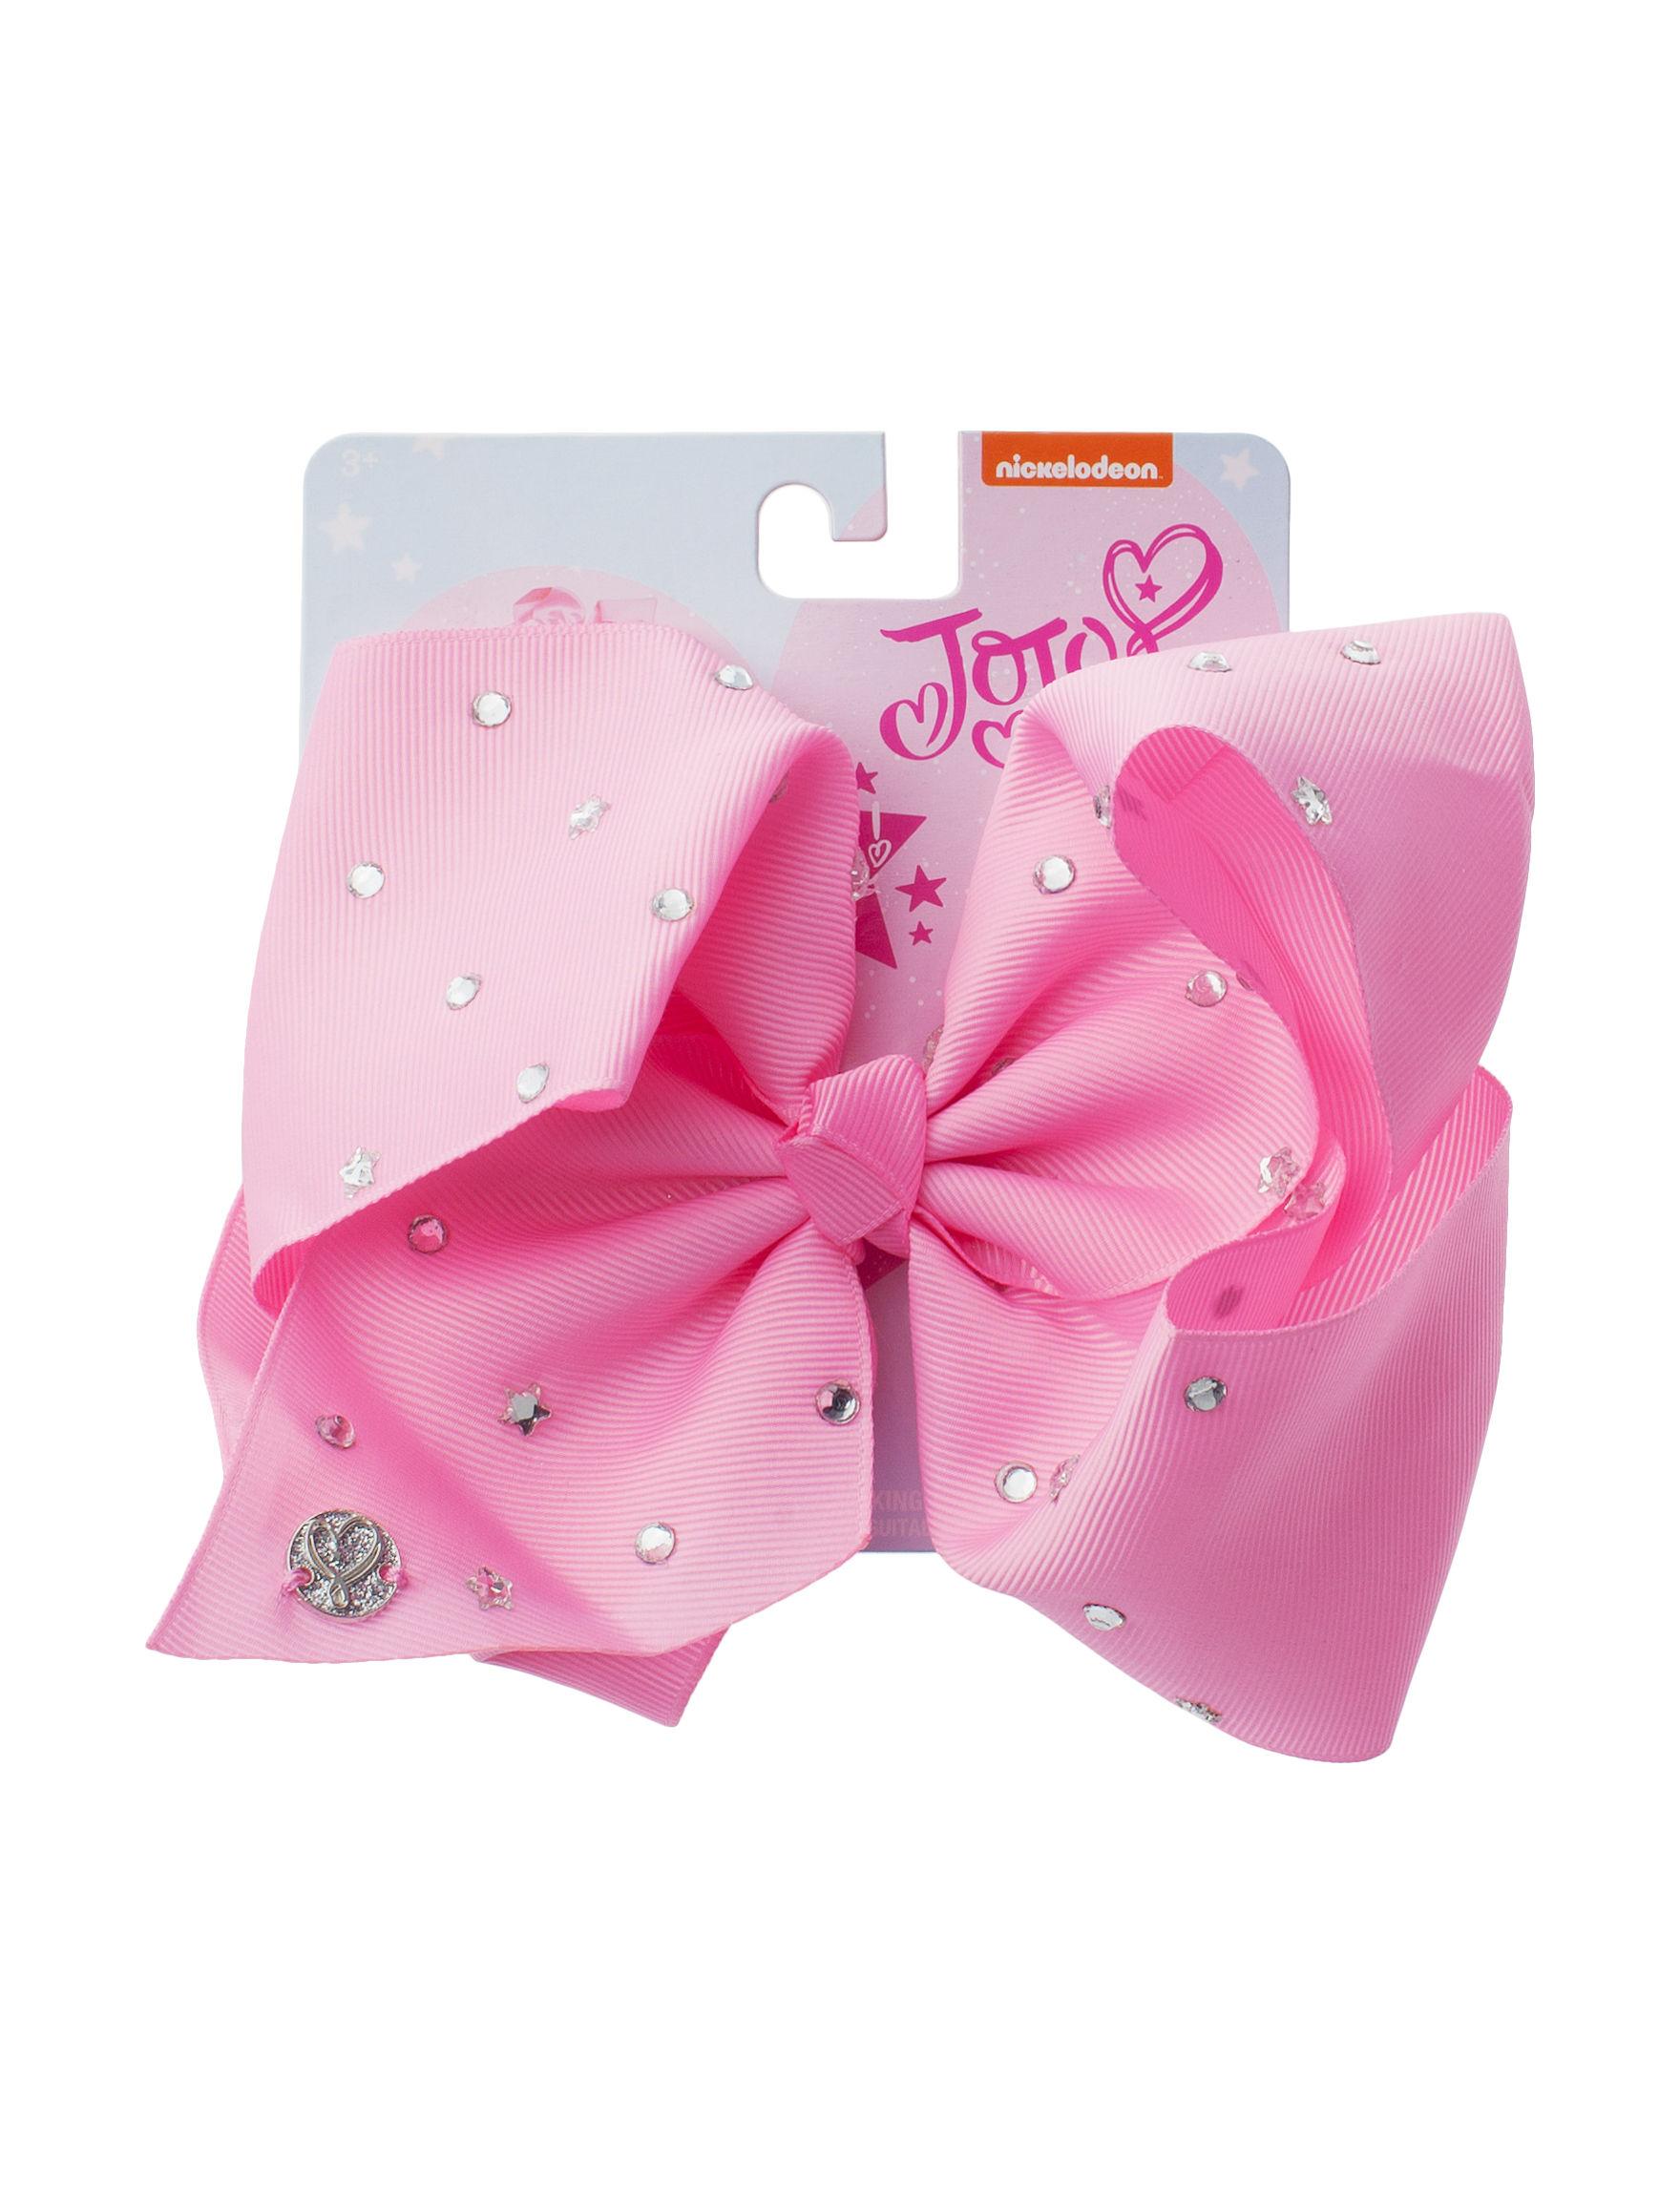 JoJo Siwa Pink